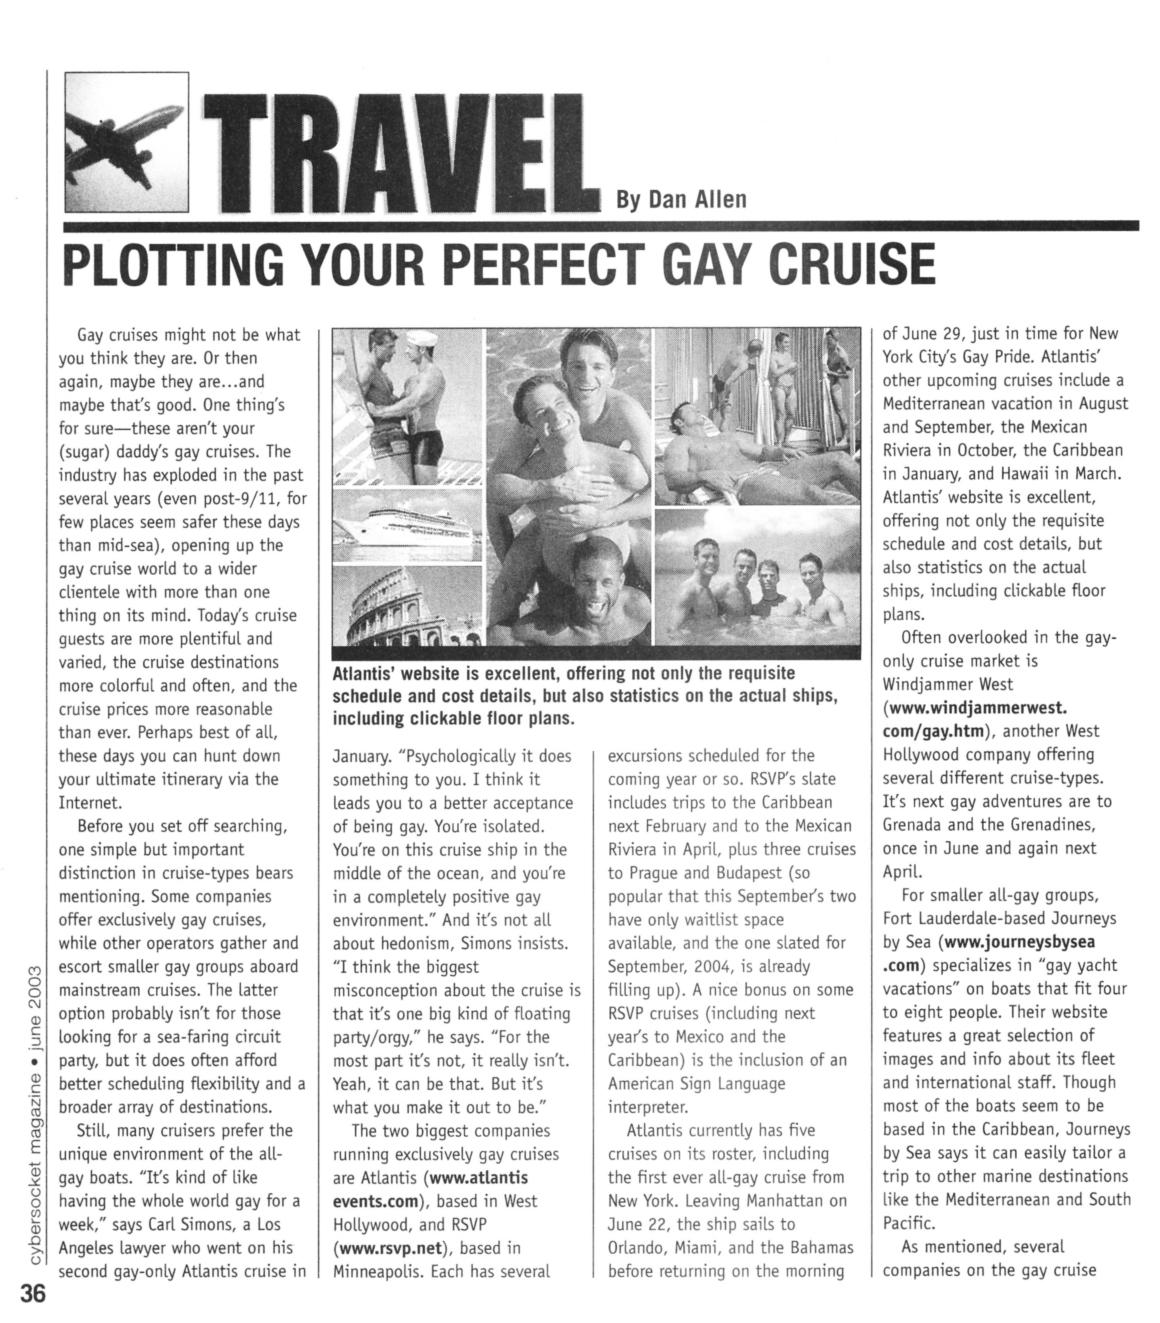 cybersocket | jun 2003 | gay cruises